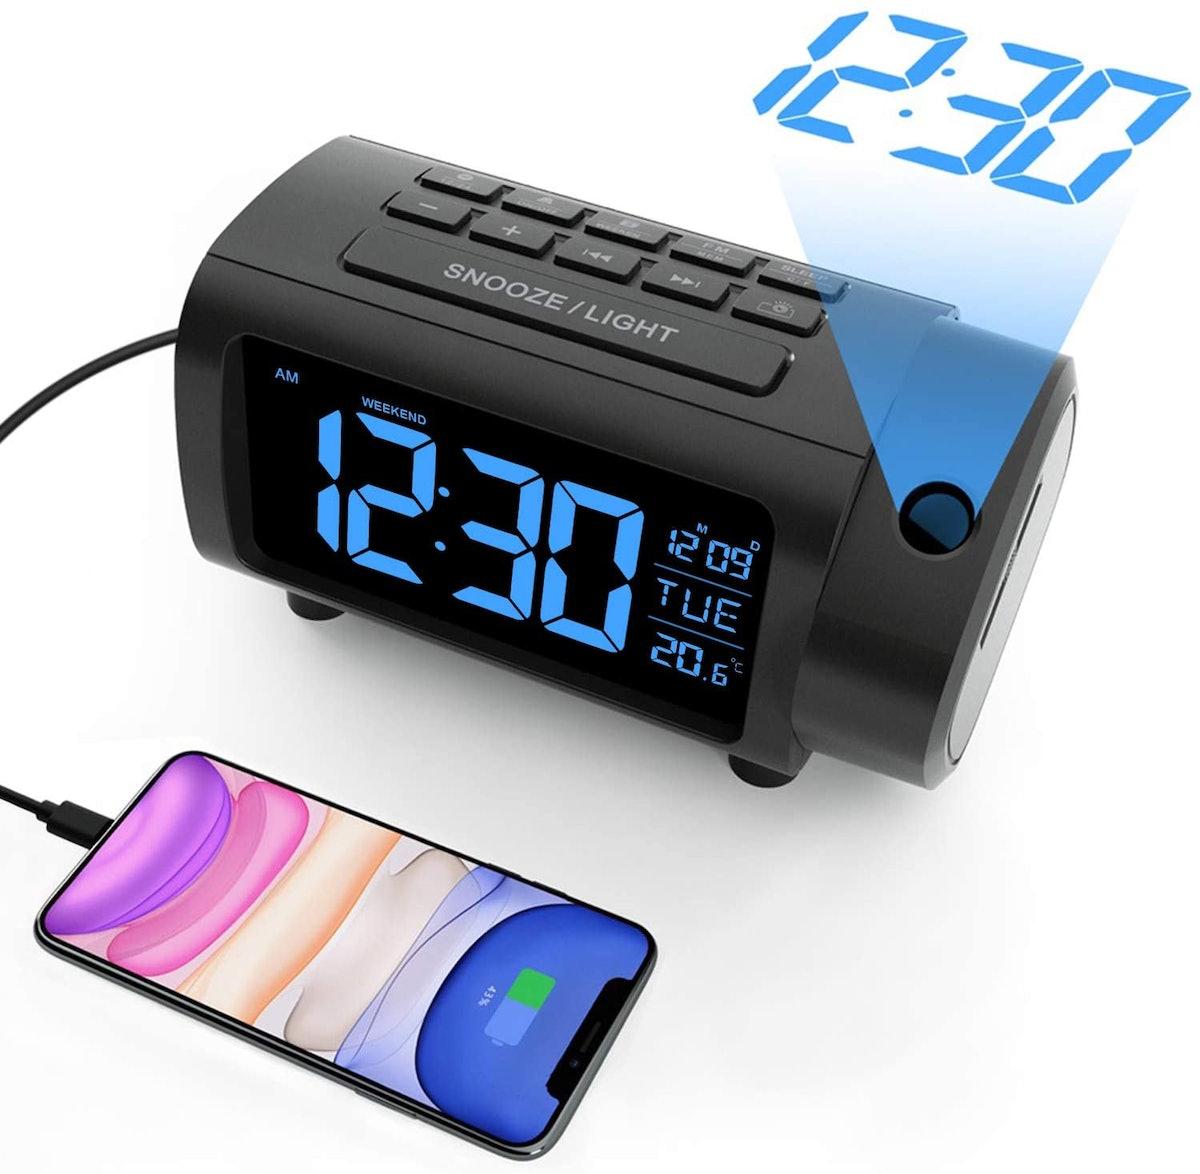 LIORQUE Projection Alarm Clock